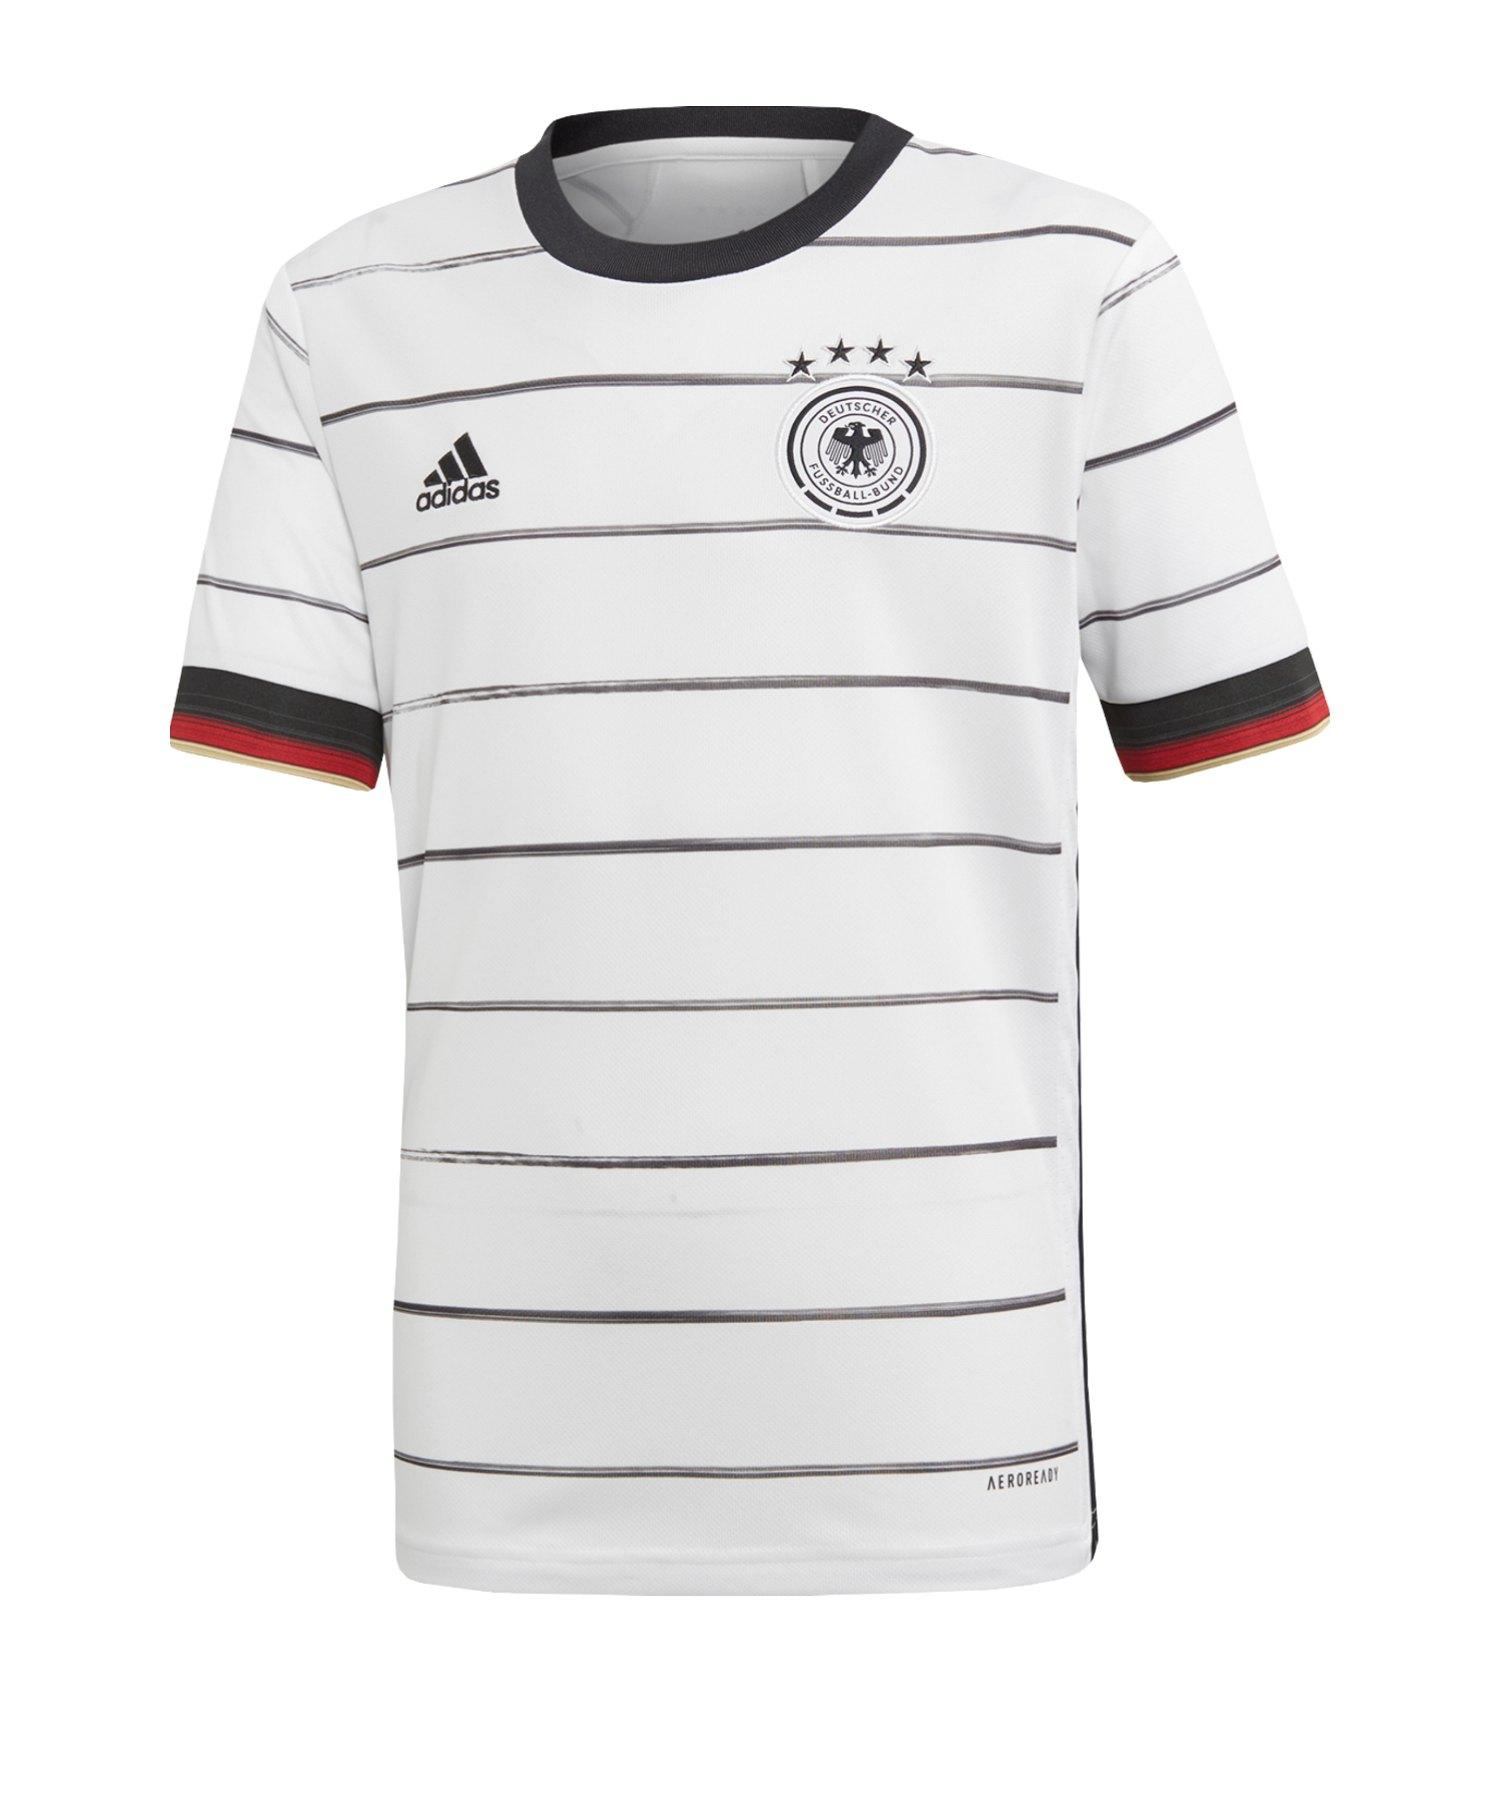 adidas DFB Deutschland Trikot Home EM 2020 Kids - weiss